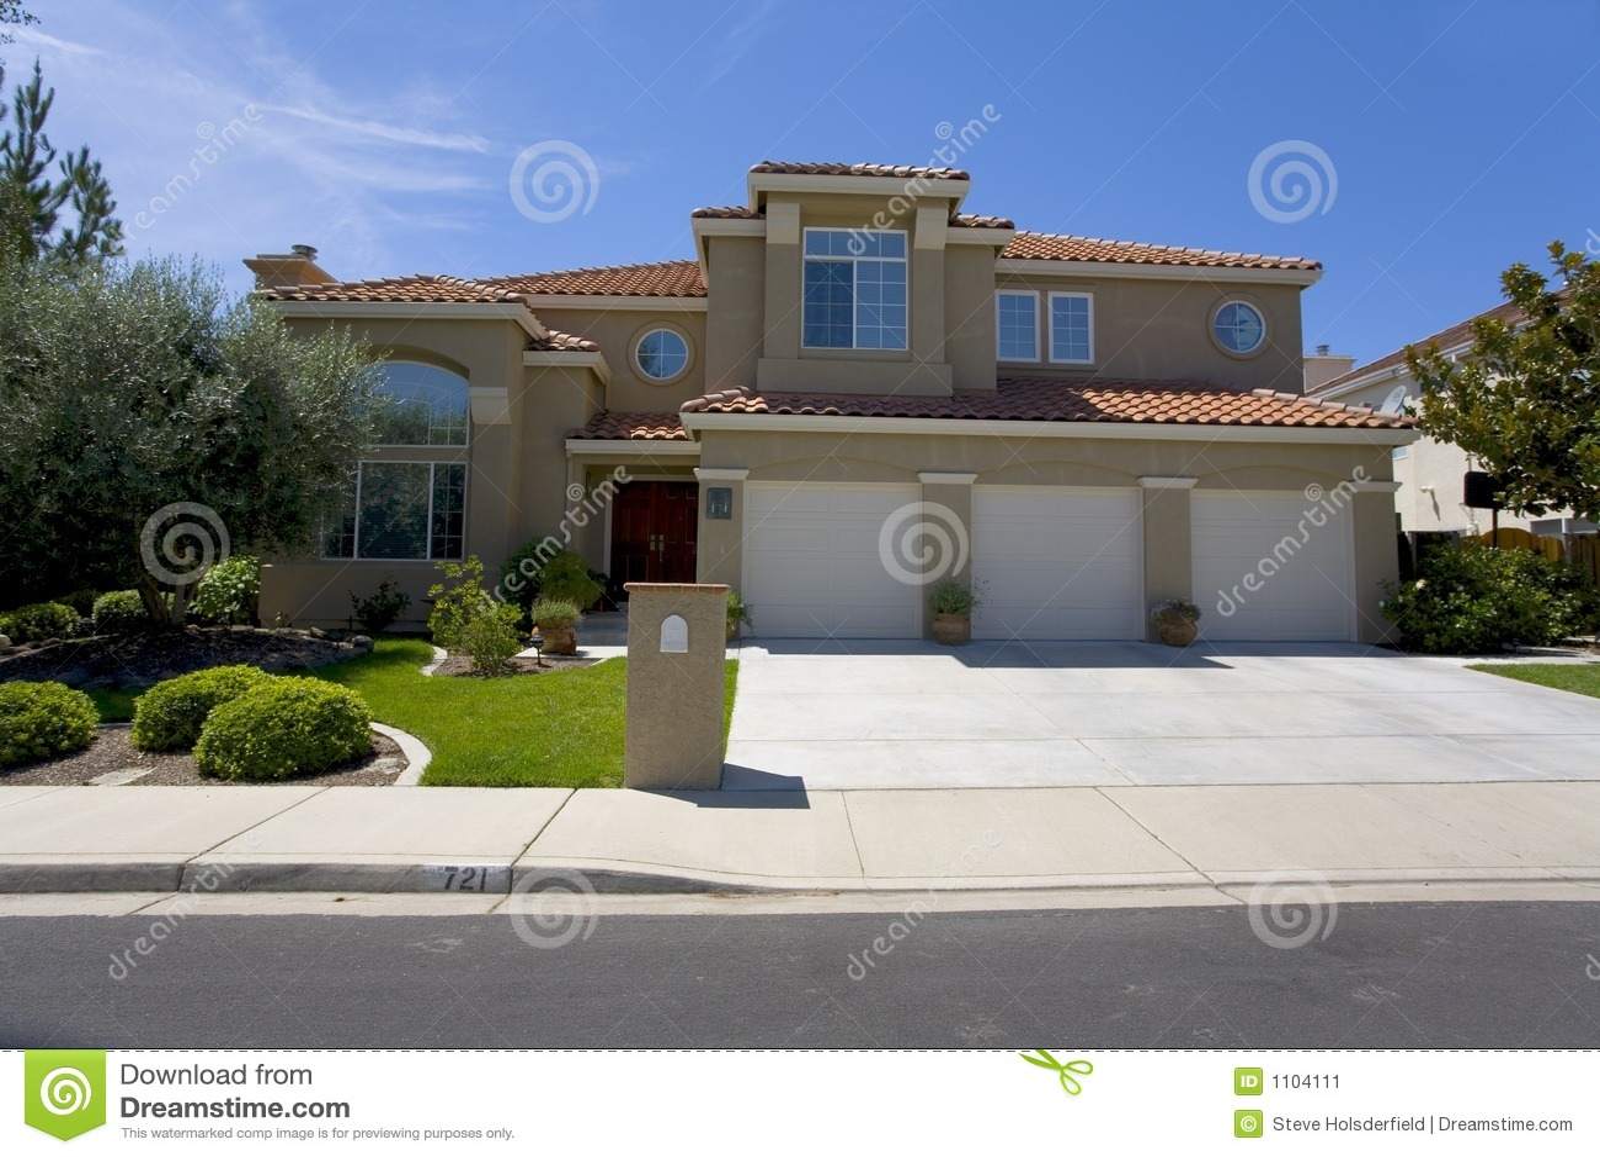 Grande maison de luxe de stuc image stock image 1104111 for Grande maison moderne